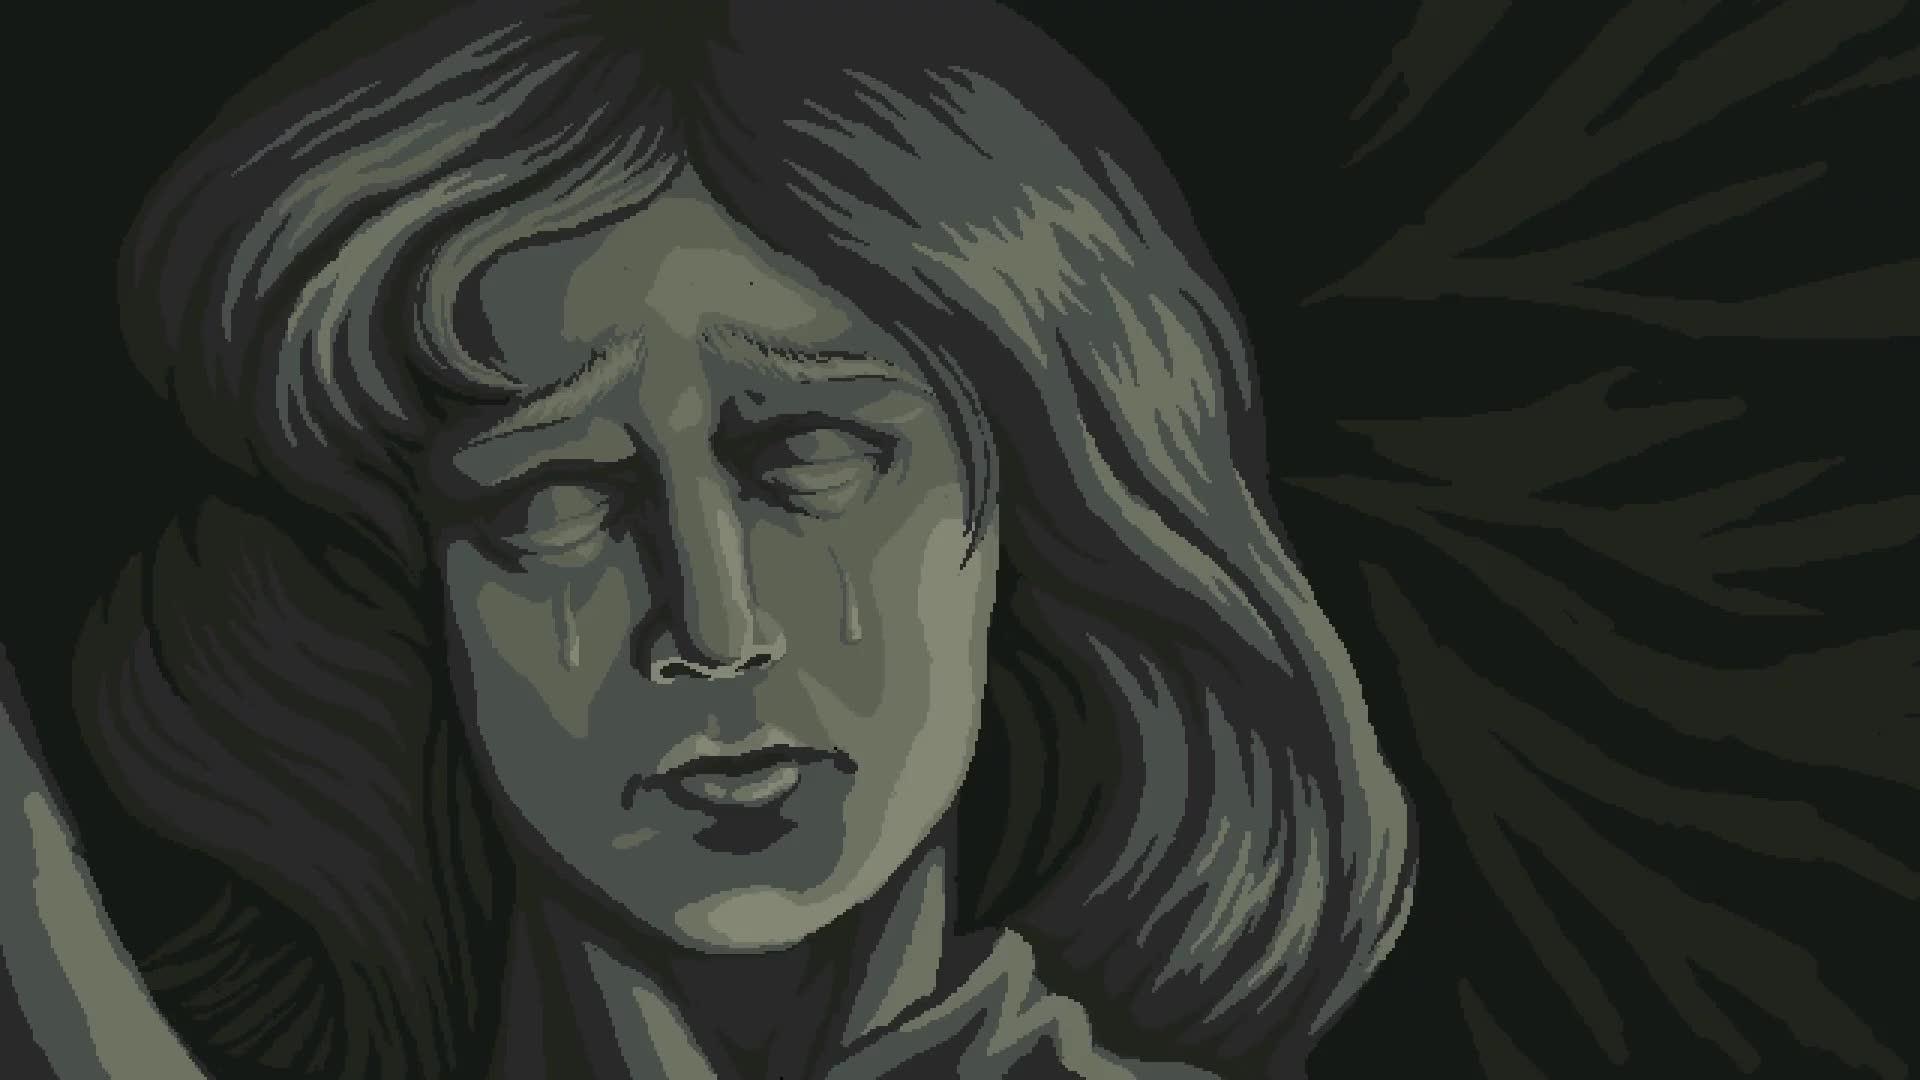 Blasphemous - Release Date Trailer [HD] screen capture